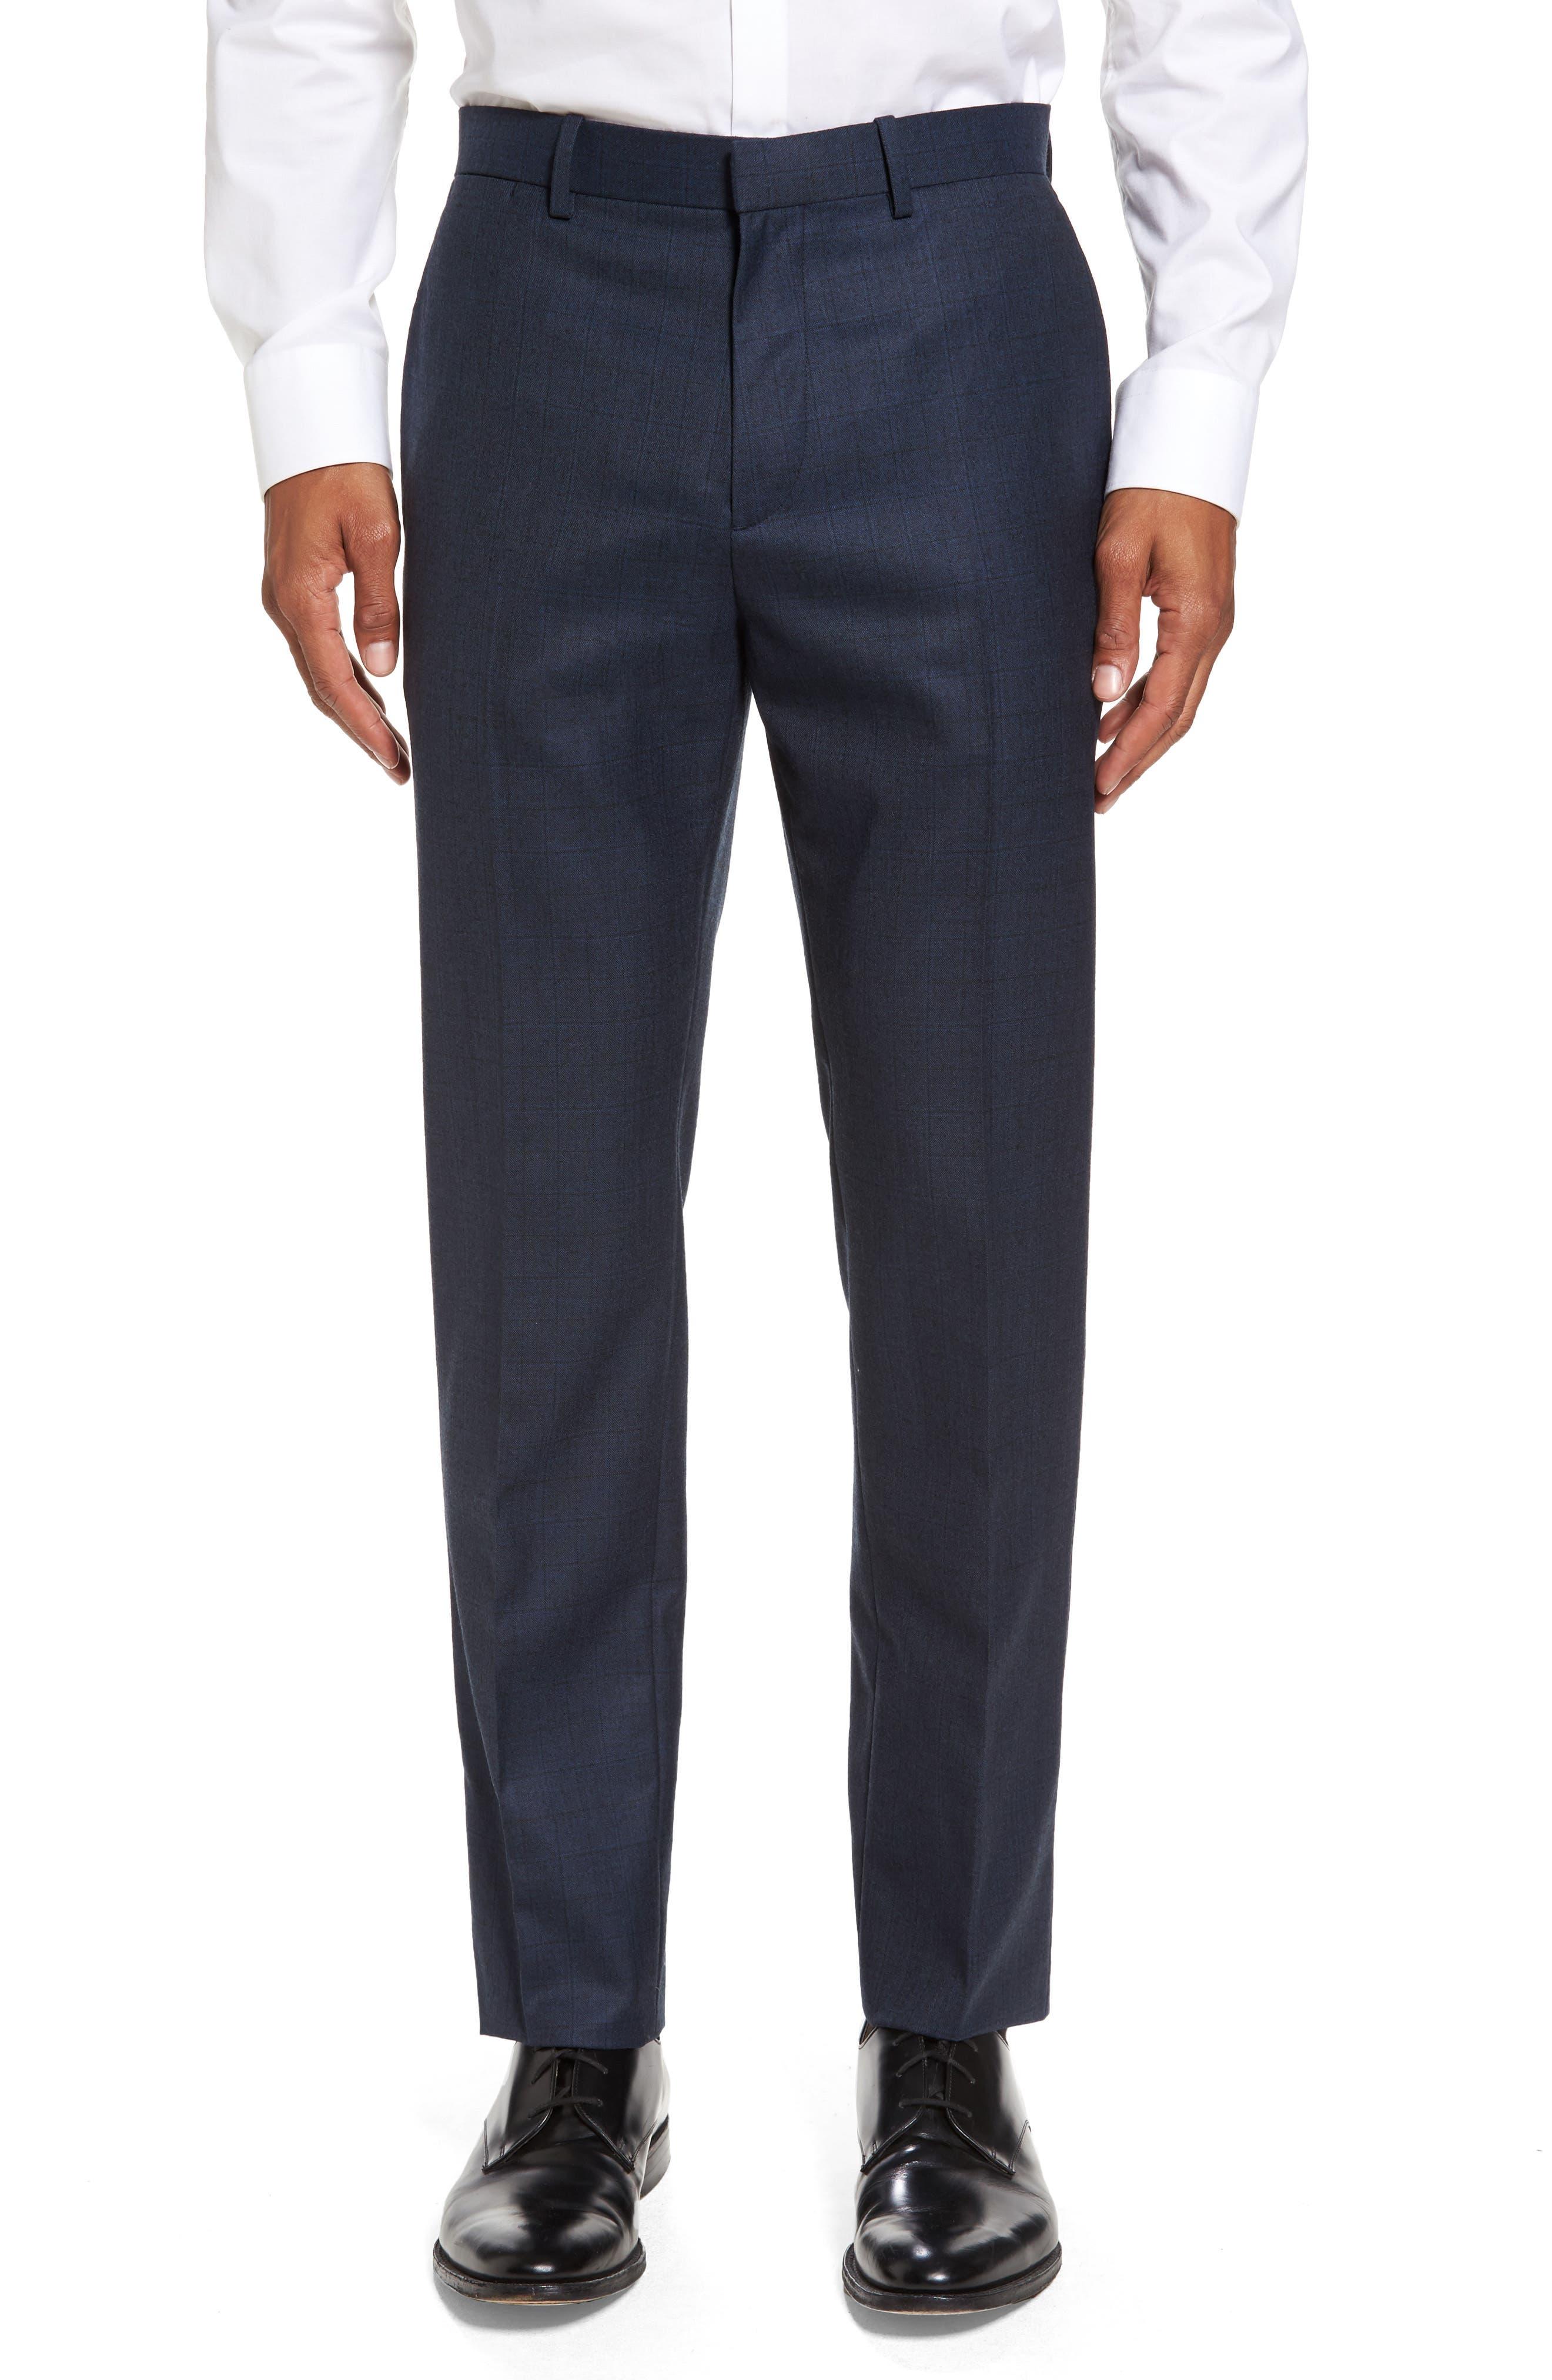 Theory Jake Sharkskin Slim Wool Trousers